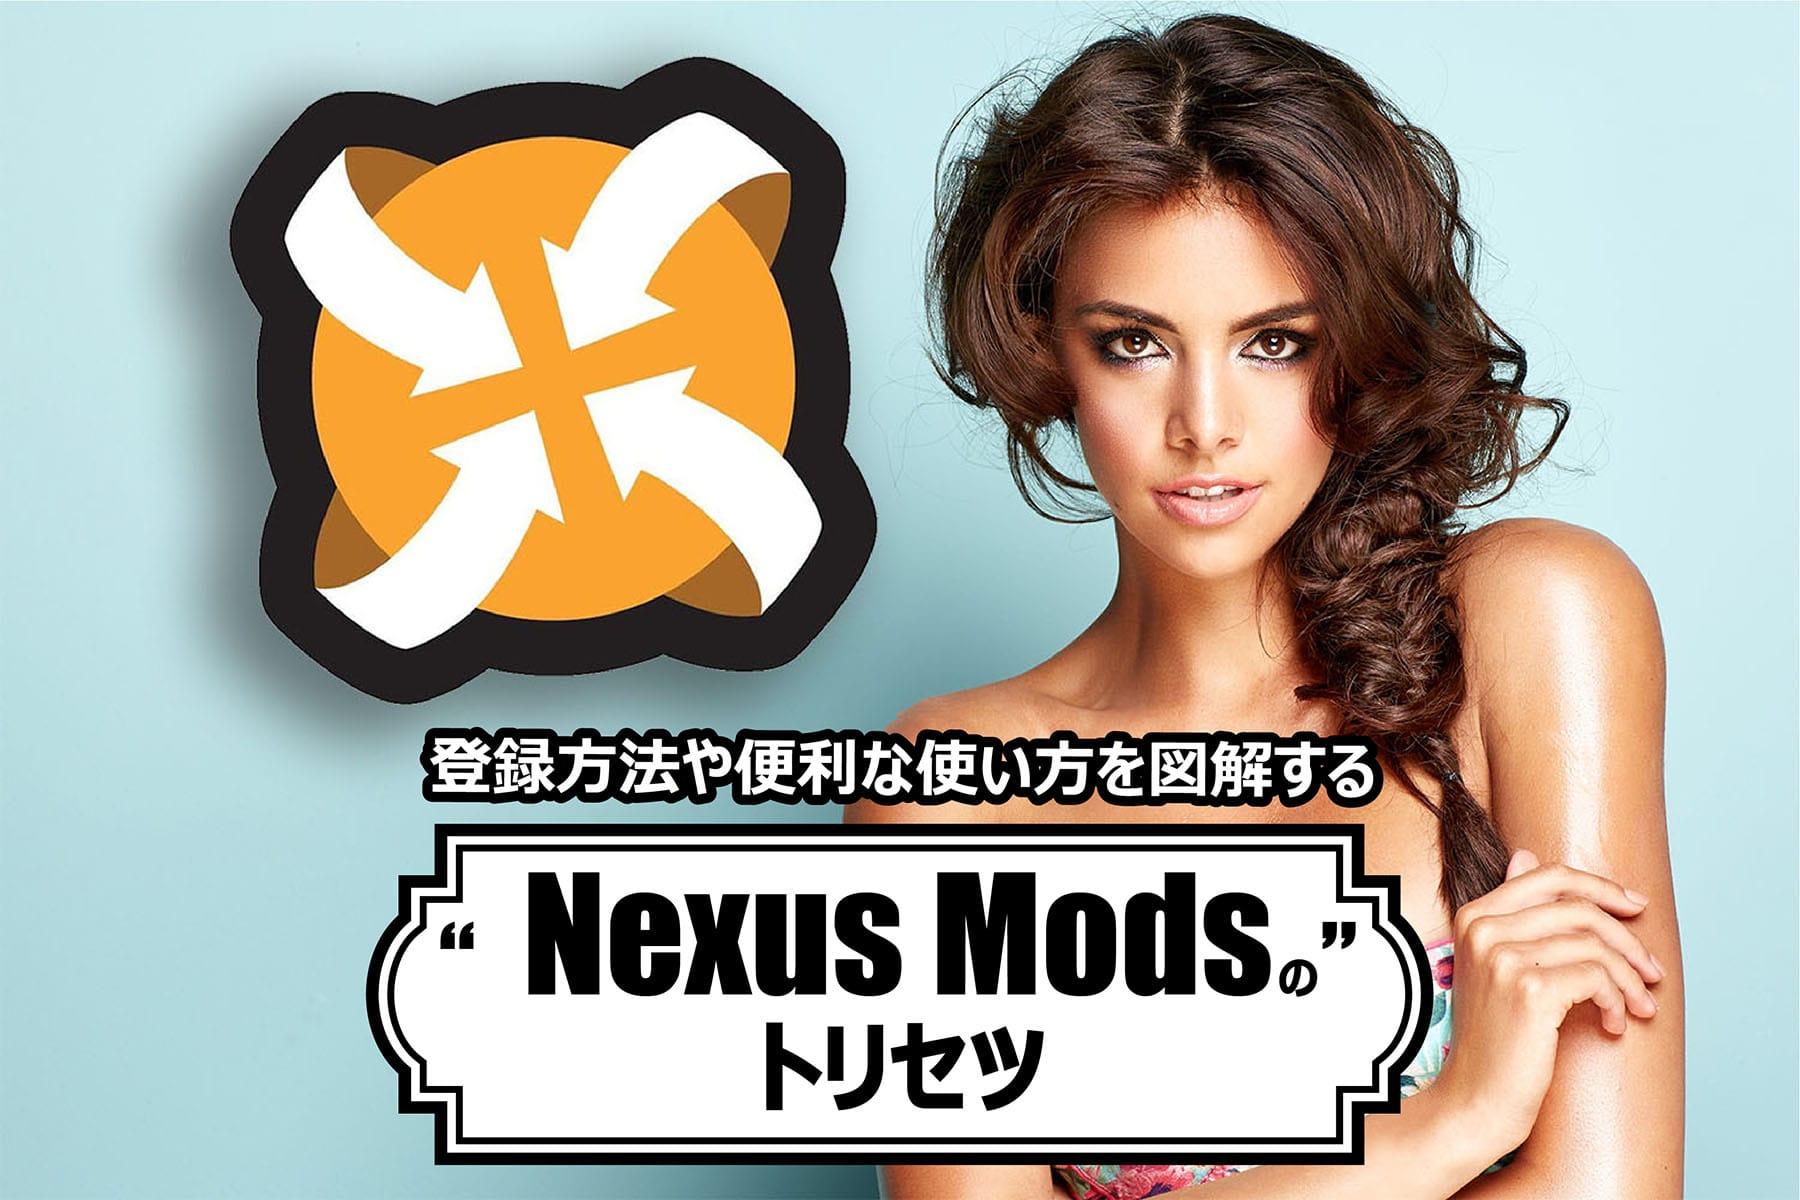 nexus modsのトリセツのイメージ画像